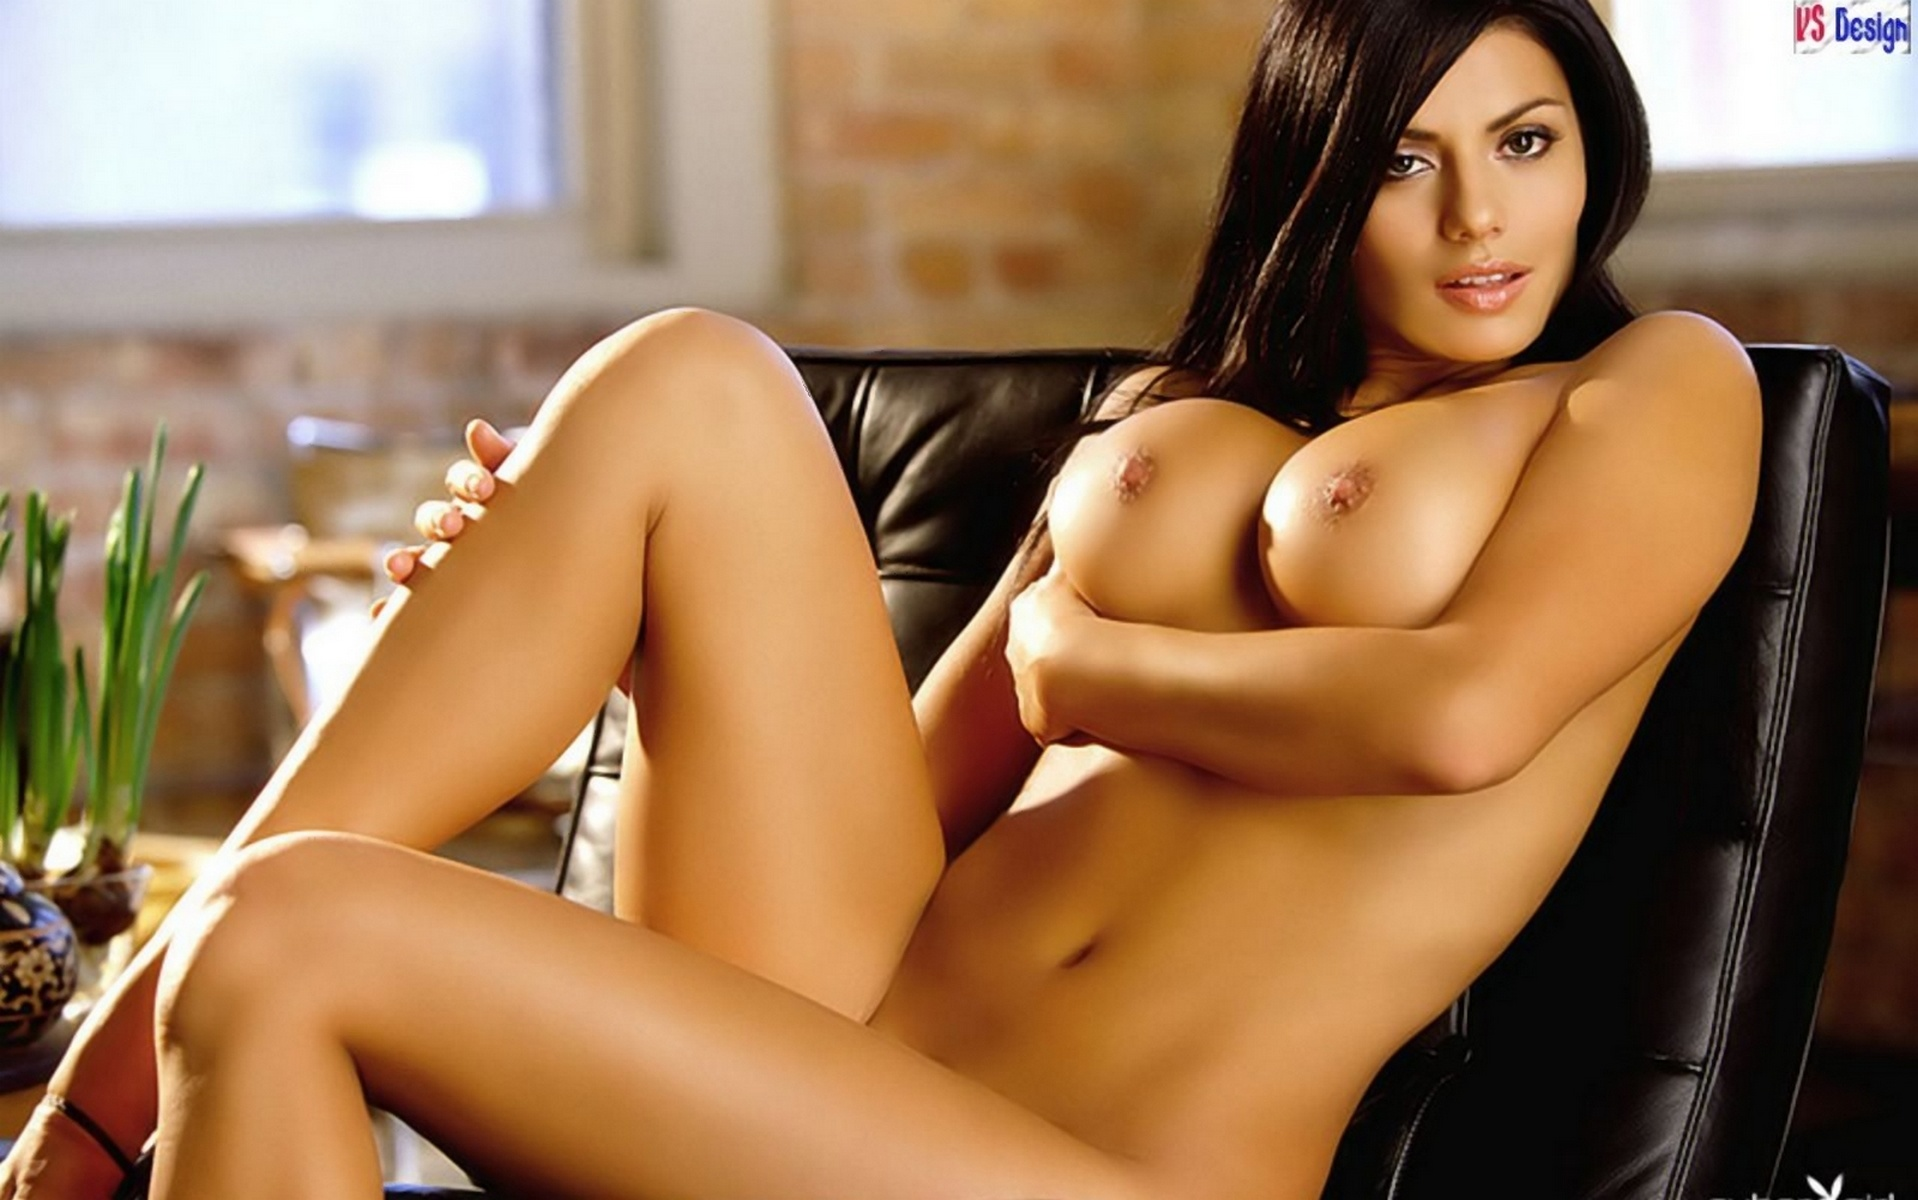 Download Photo 1918X1200, Erotic, Sexy, Nude, Girls, Cute -8768